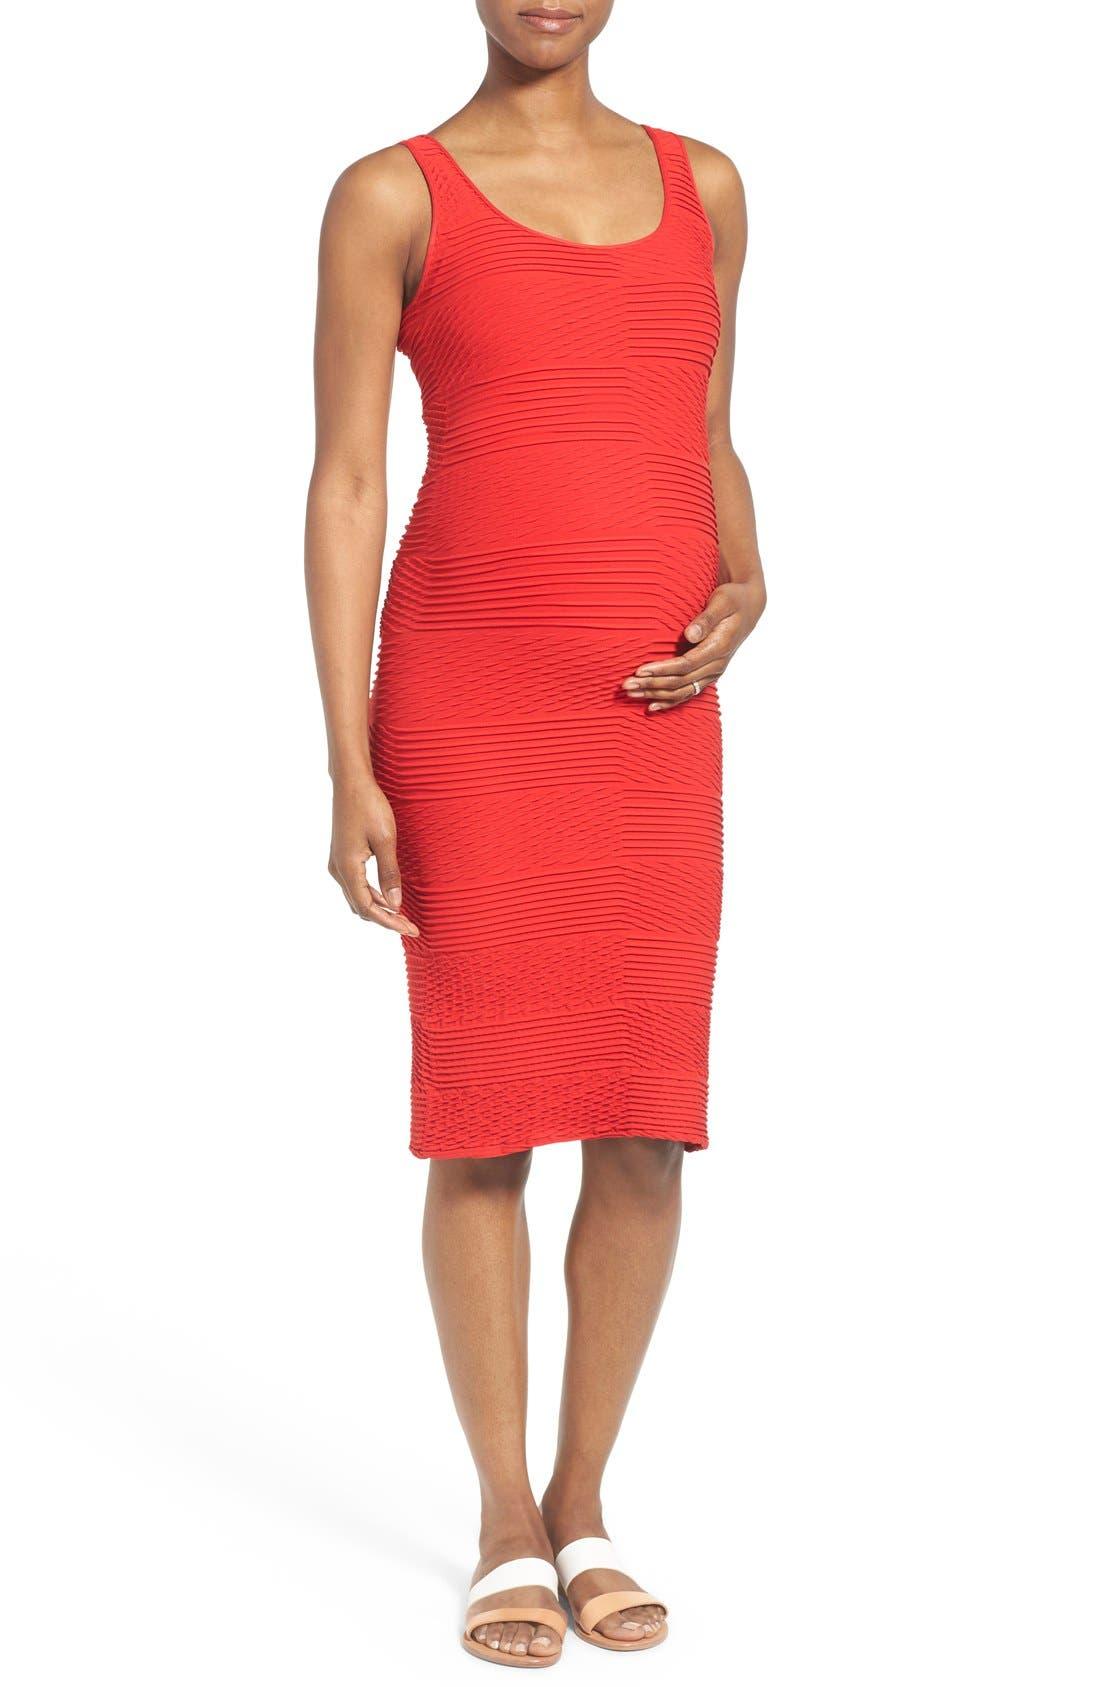 Main Image - Tees by Tina Textured Tank Maternity Dress